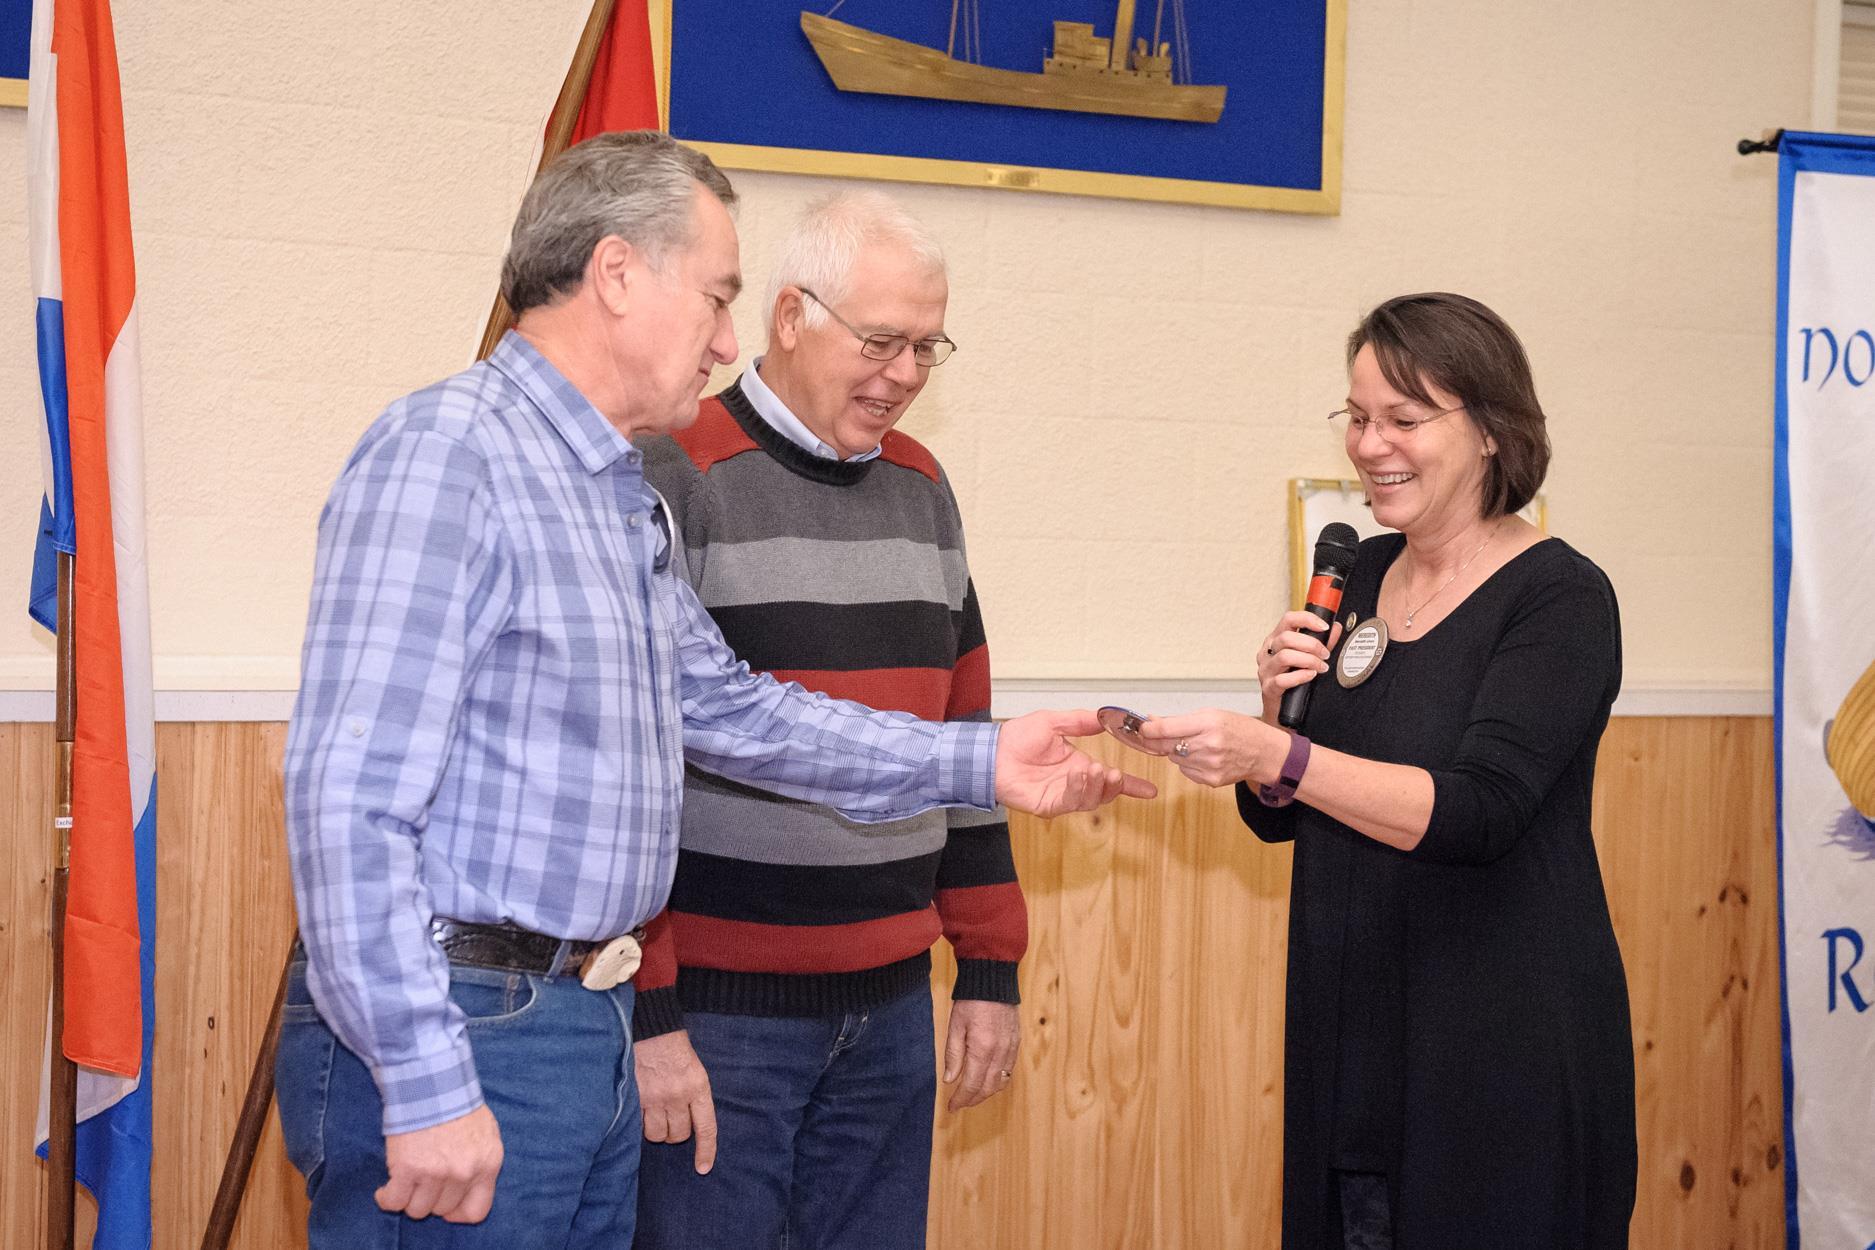 Randy Linaman rejoins Poulsbo Rotary